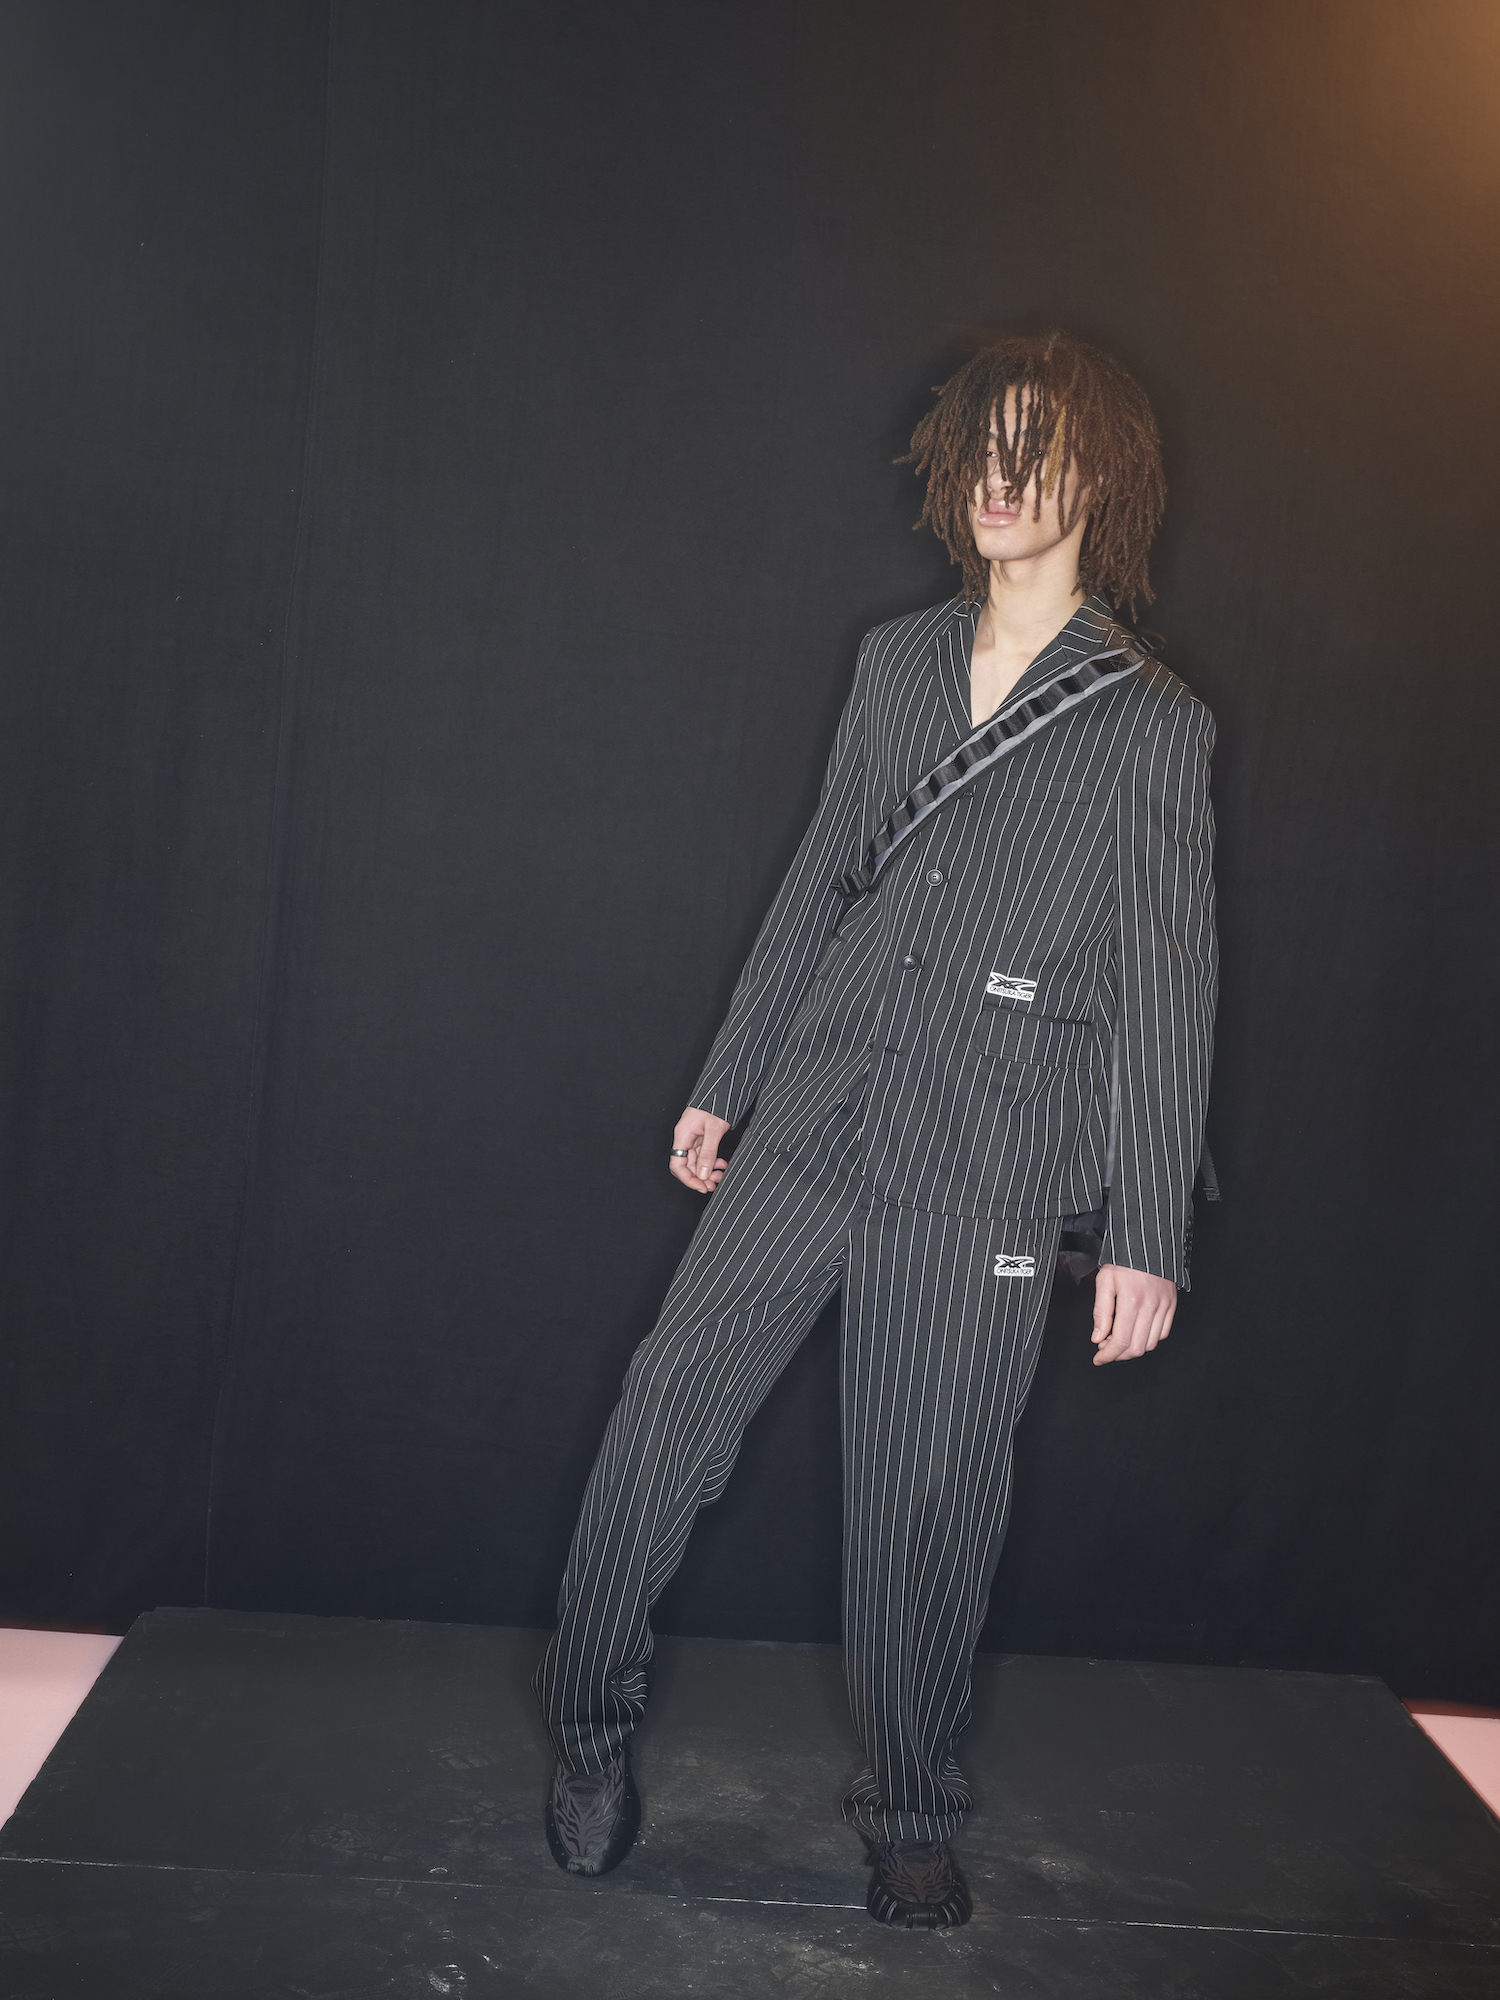 Onitsuka Tiger Autumn _ Winter 2021 collection_Milan Fashion Show_01.jpg